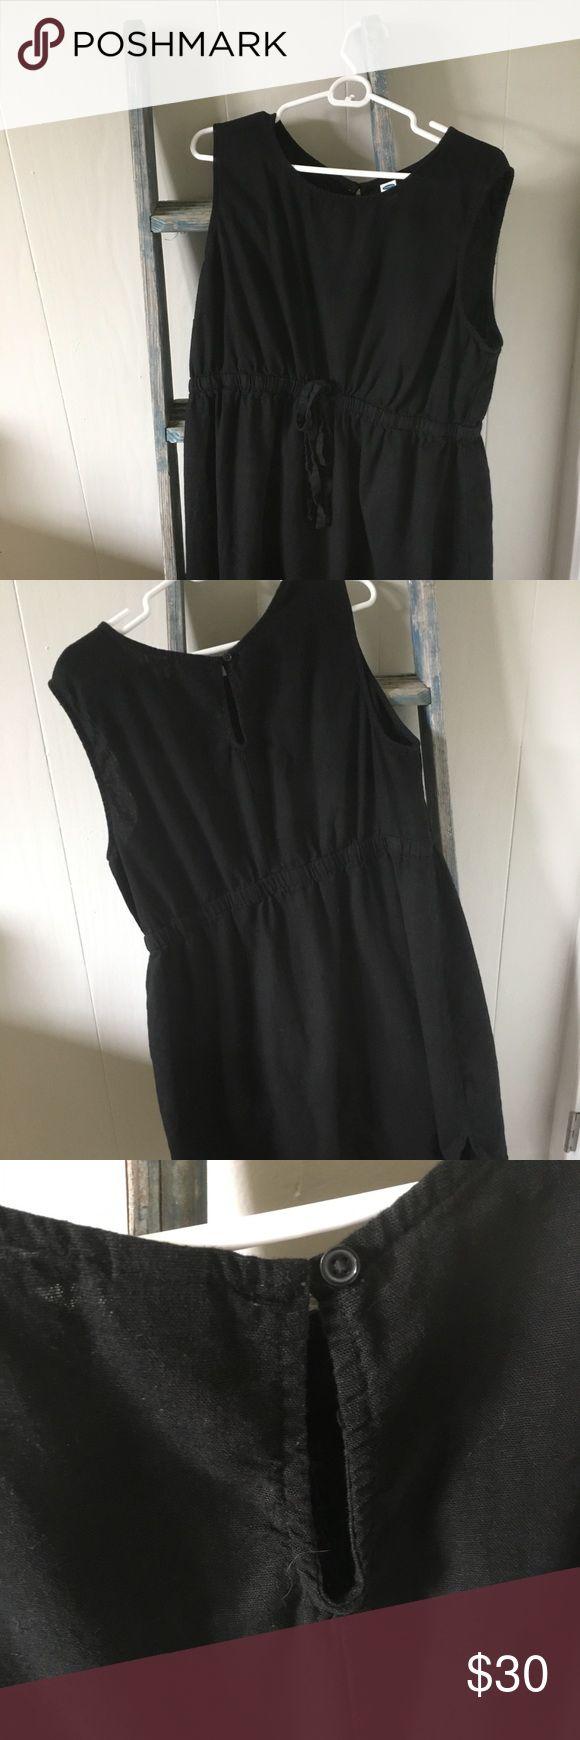 Old Navy Maternity Dress in Black Old Navy Maternity Dress in Black XL, Drawstring waist, Sleeveless. Linen. Never worn! Old Navy Dresses Midi